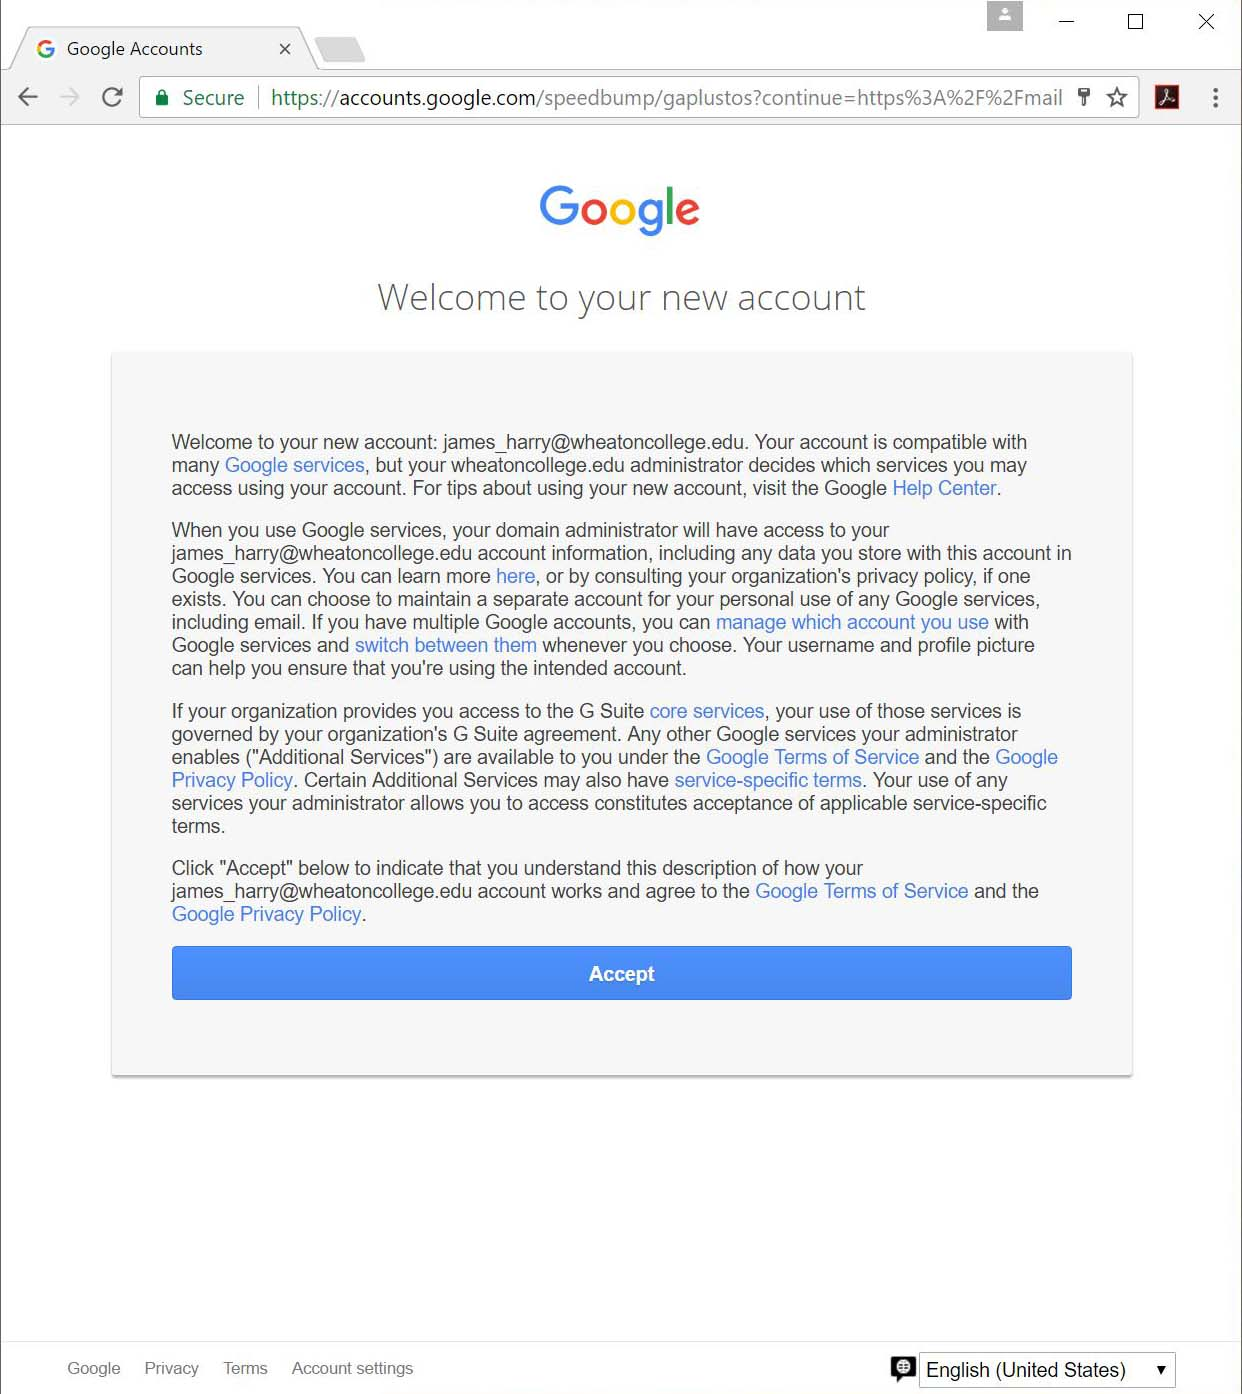 GmailTerms